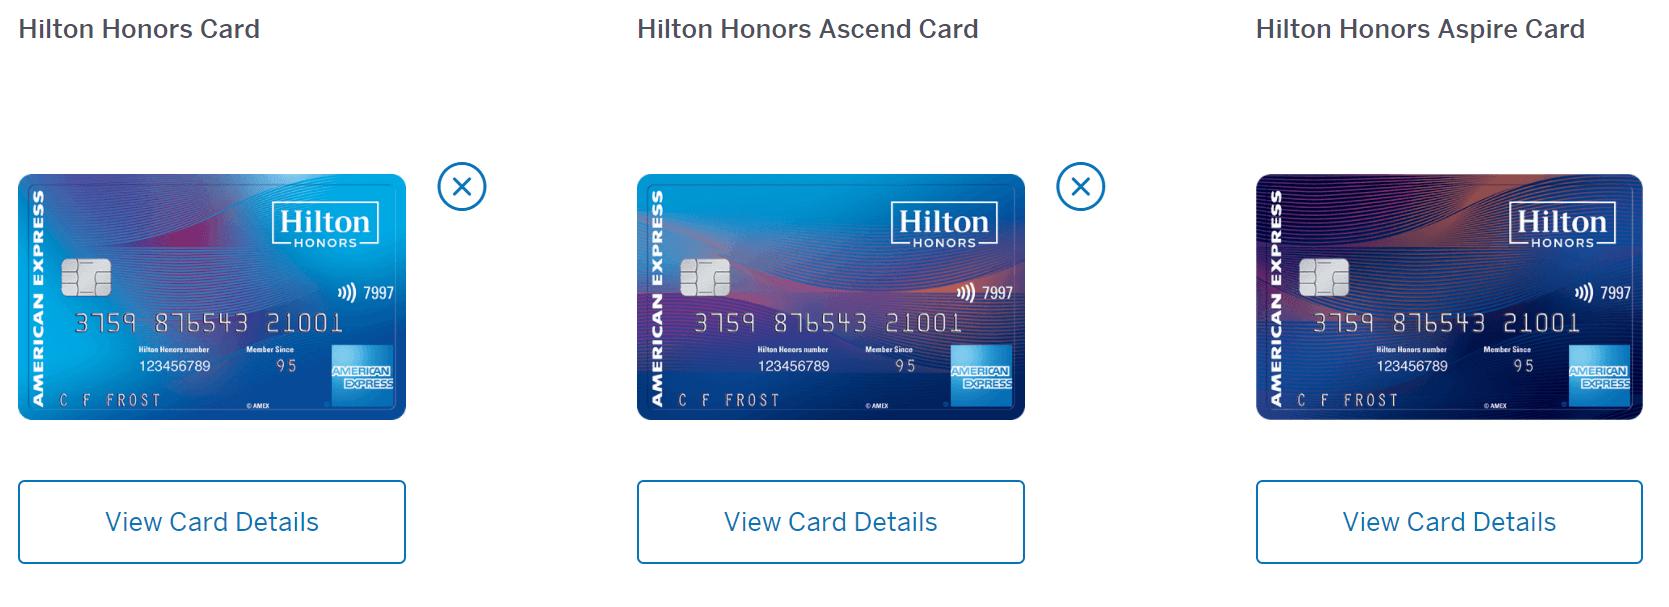 American Express Hilton cards